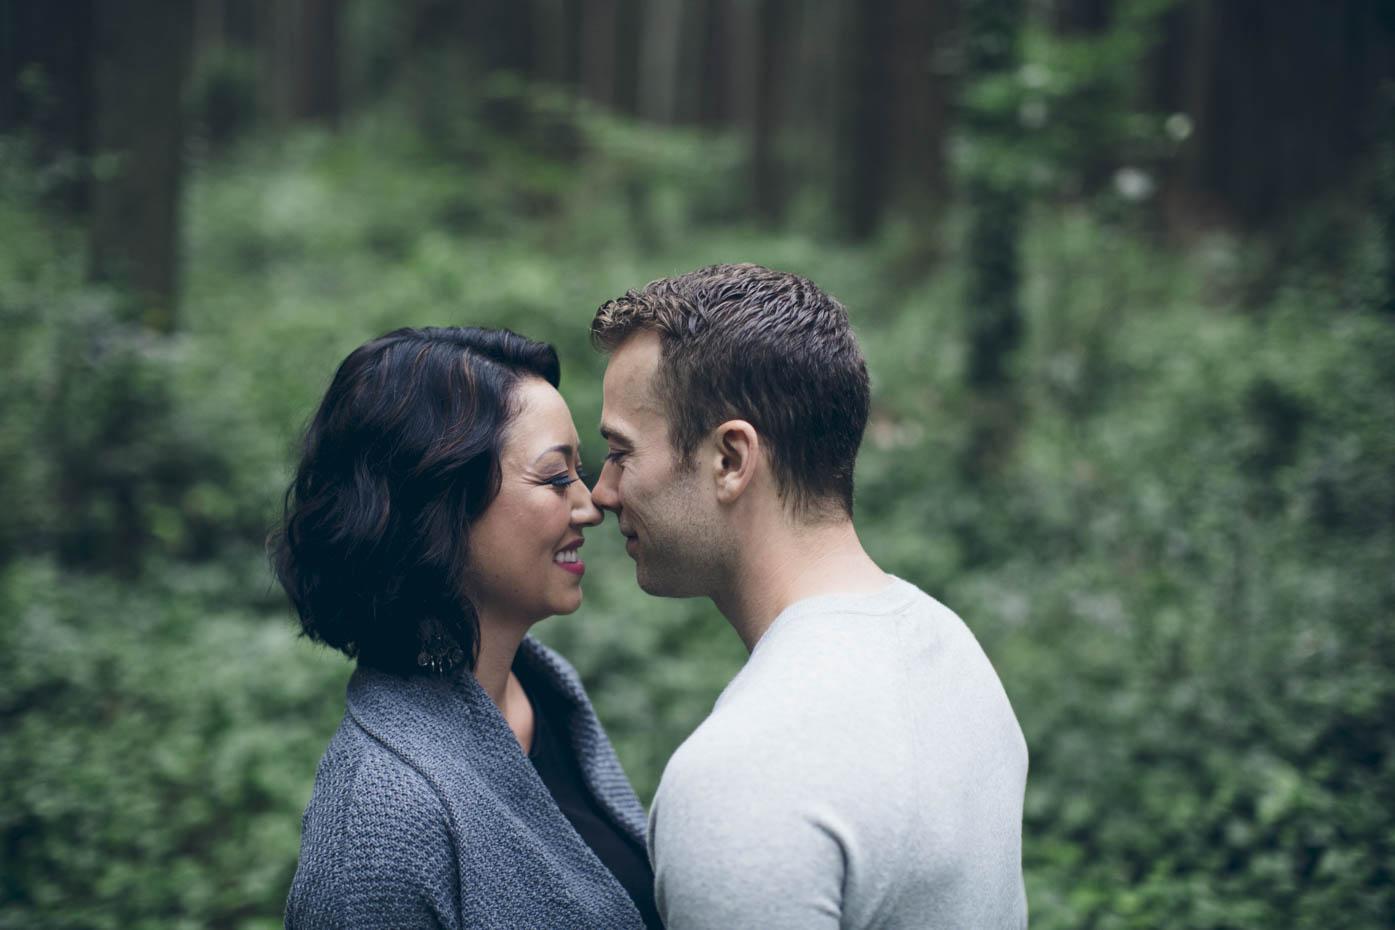 Close up portrait of engaged couple